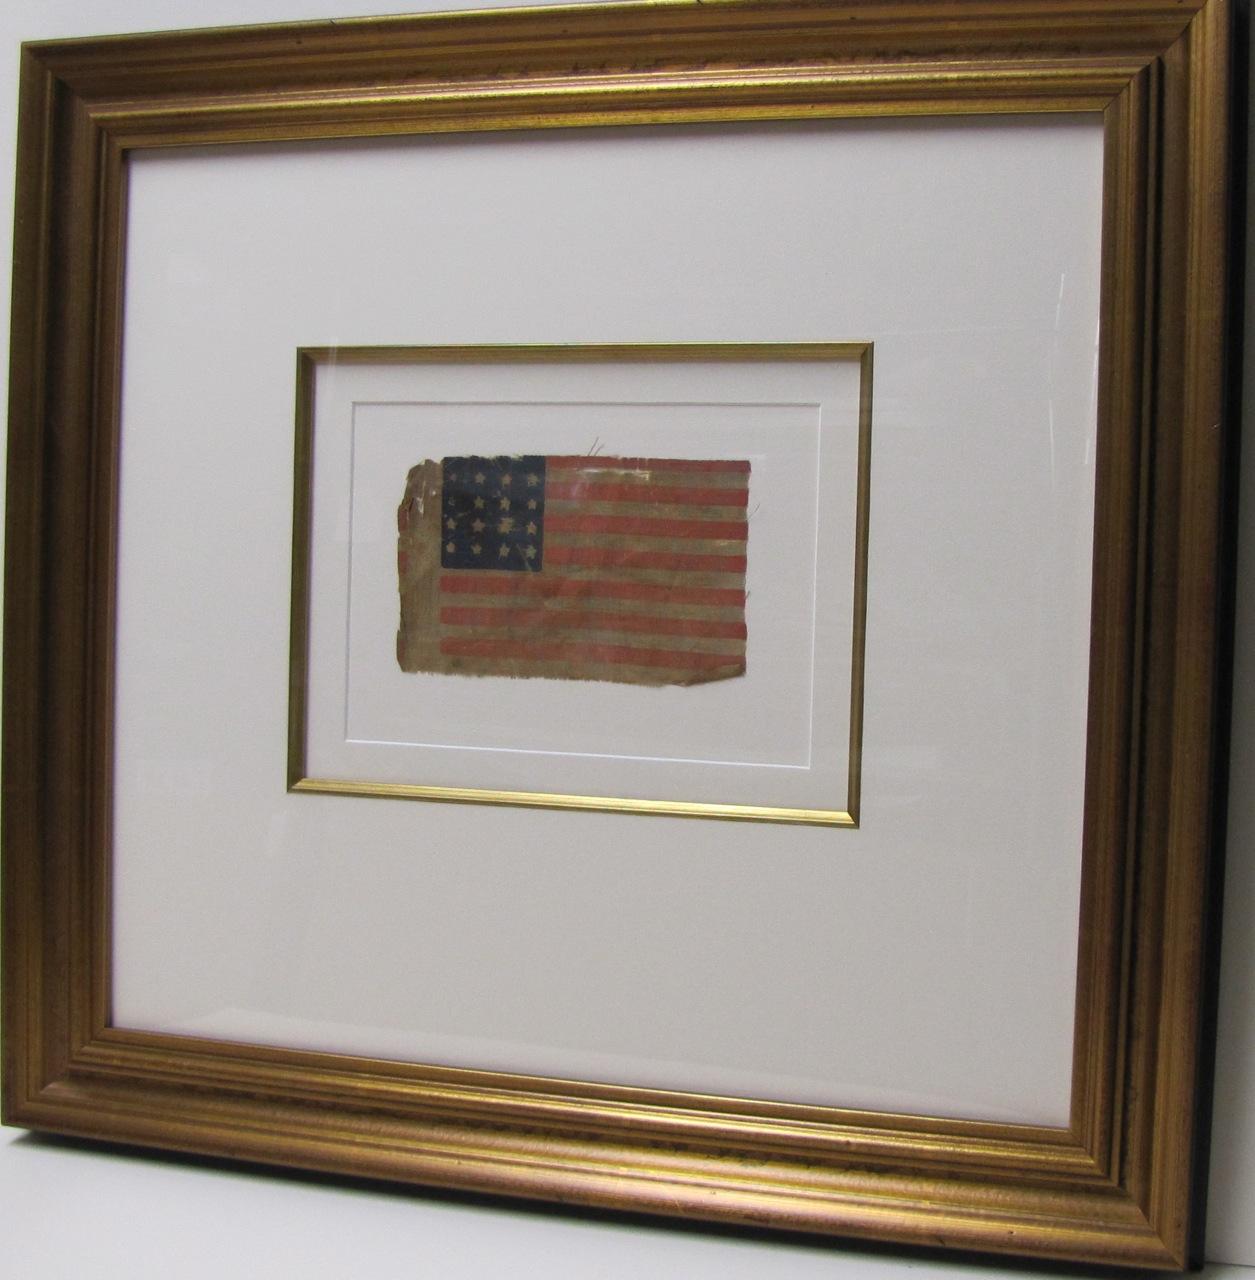 20 STAR FLAG IMAGE